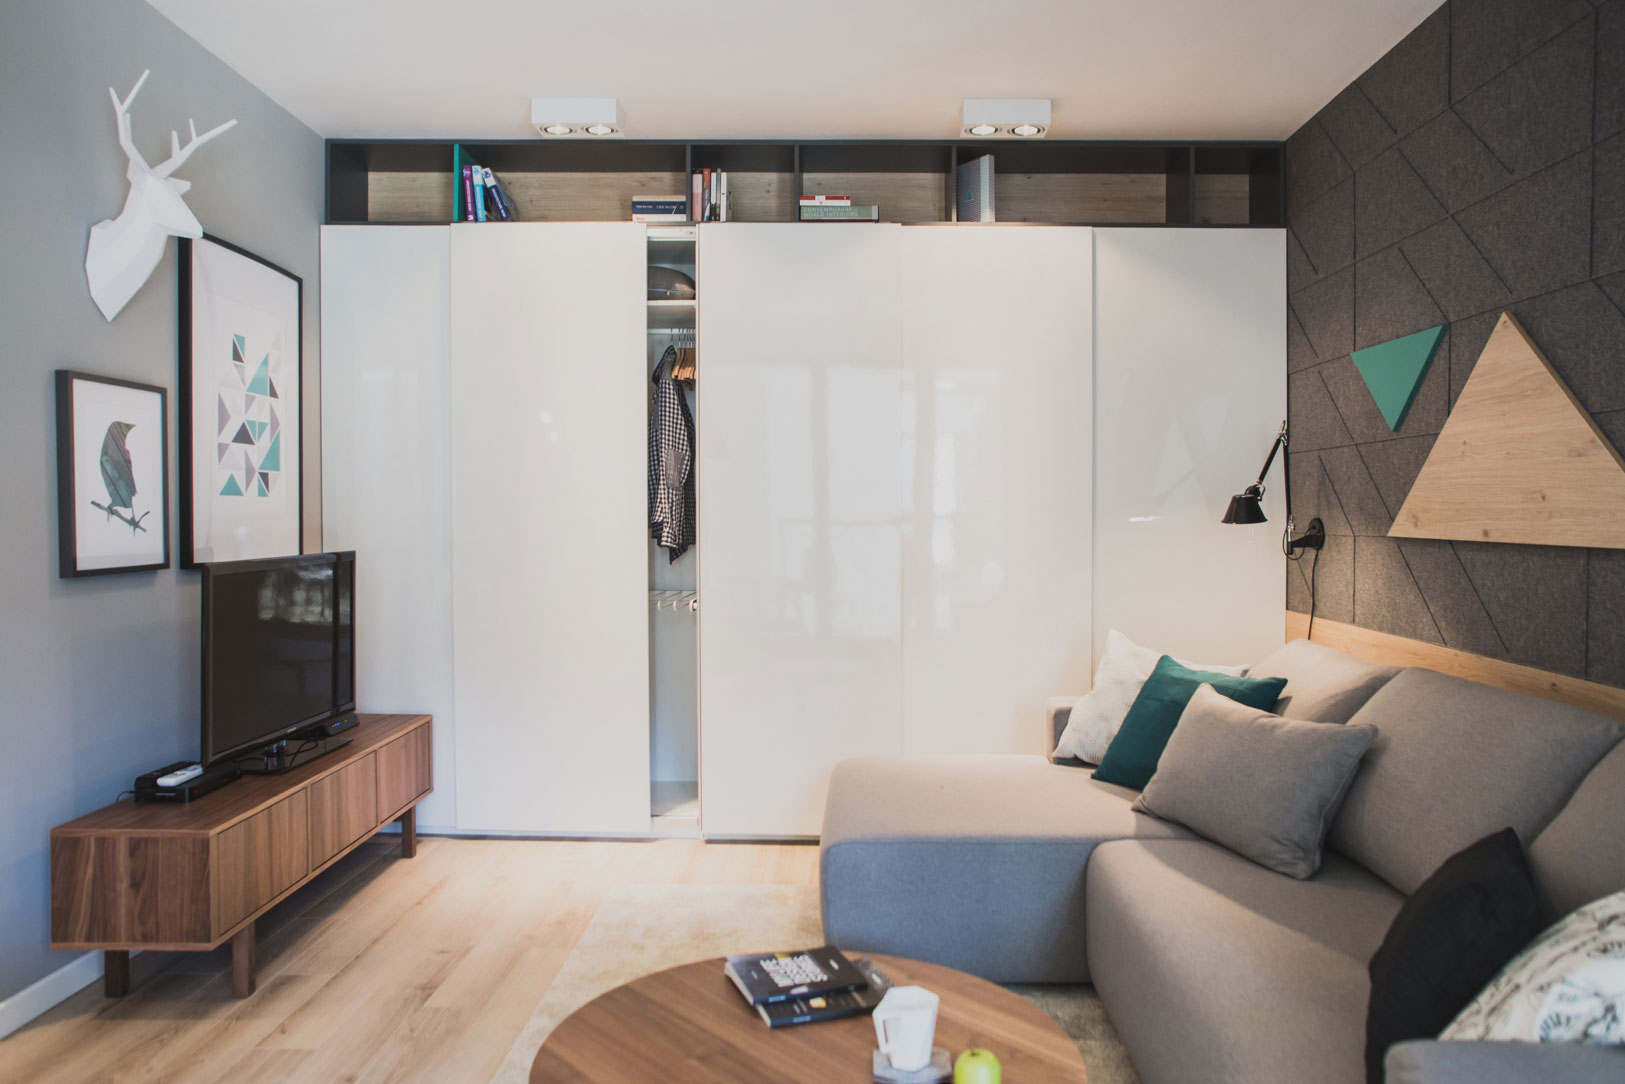 Szafarnia 2 Compact Apartment by Raca Architekci-10